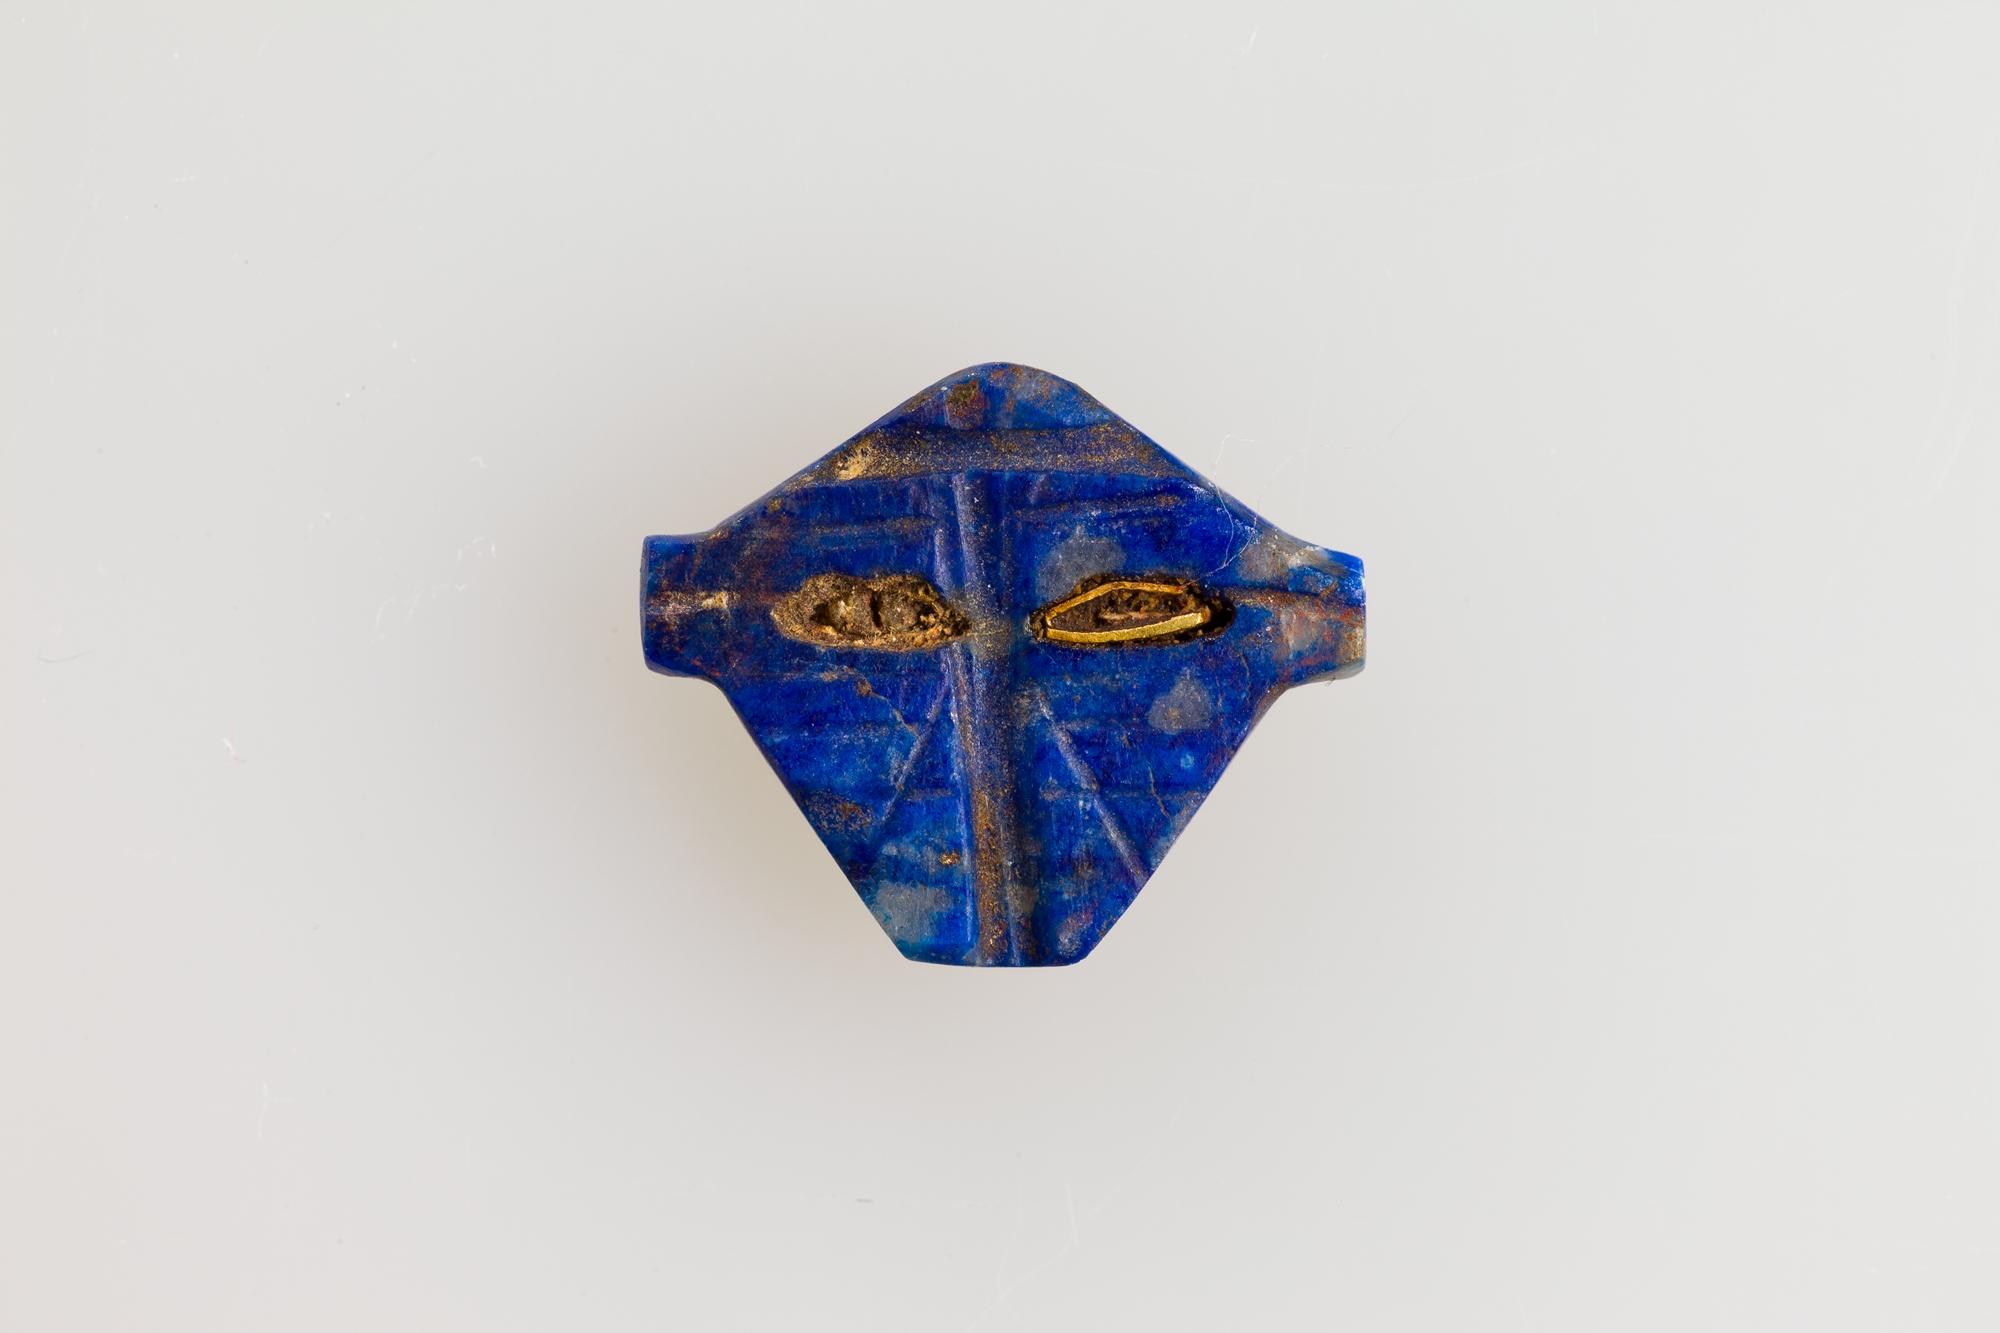 File:Face of the goddess Hathor MET 2012 178 EGDP014912 jpg